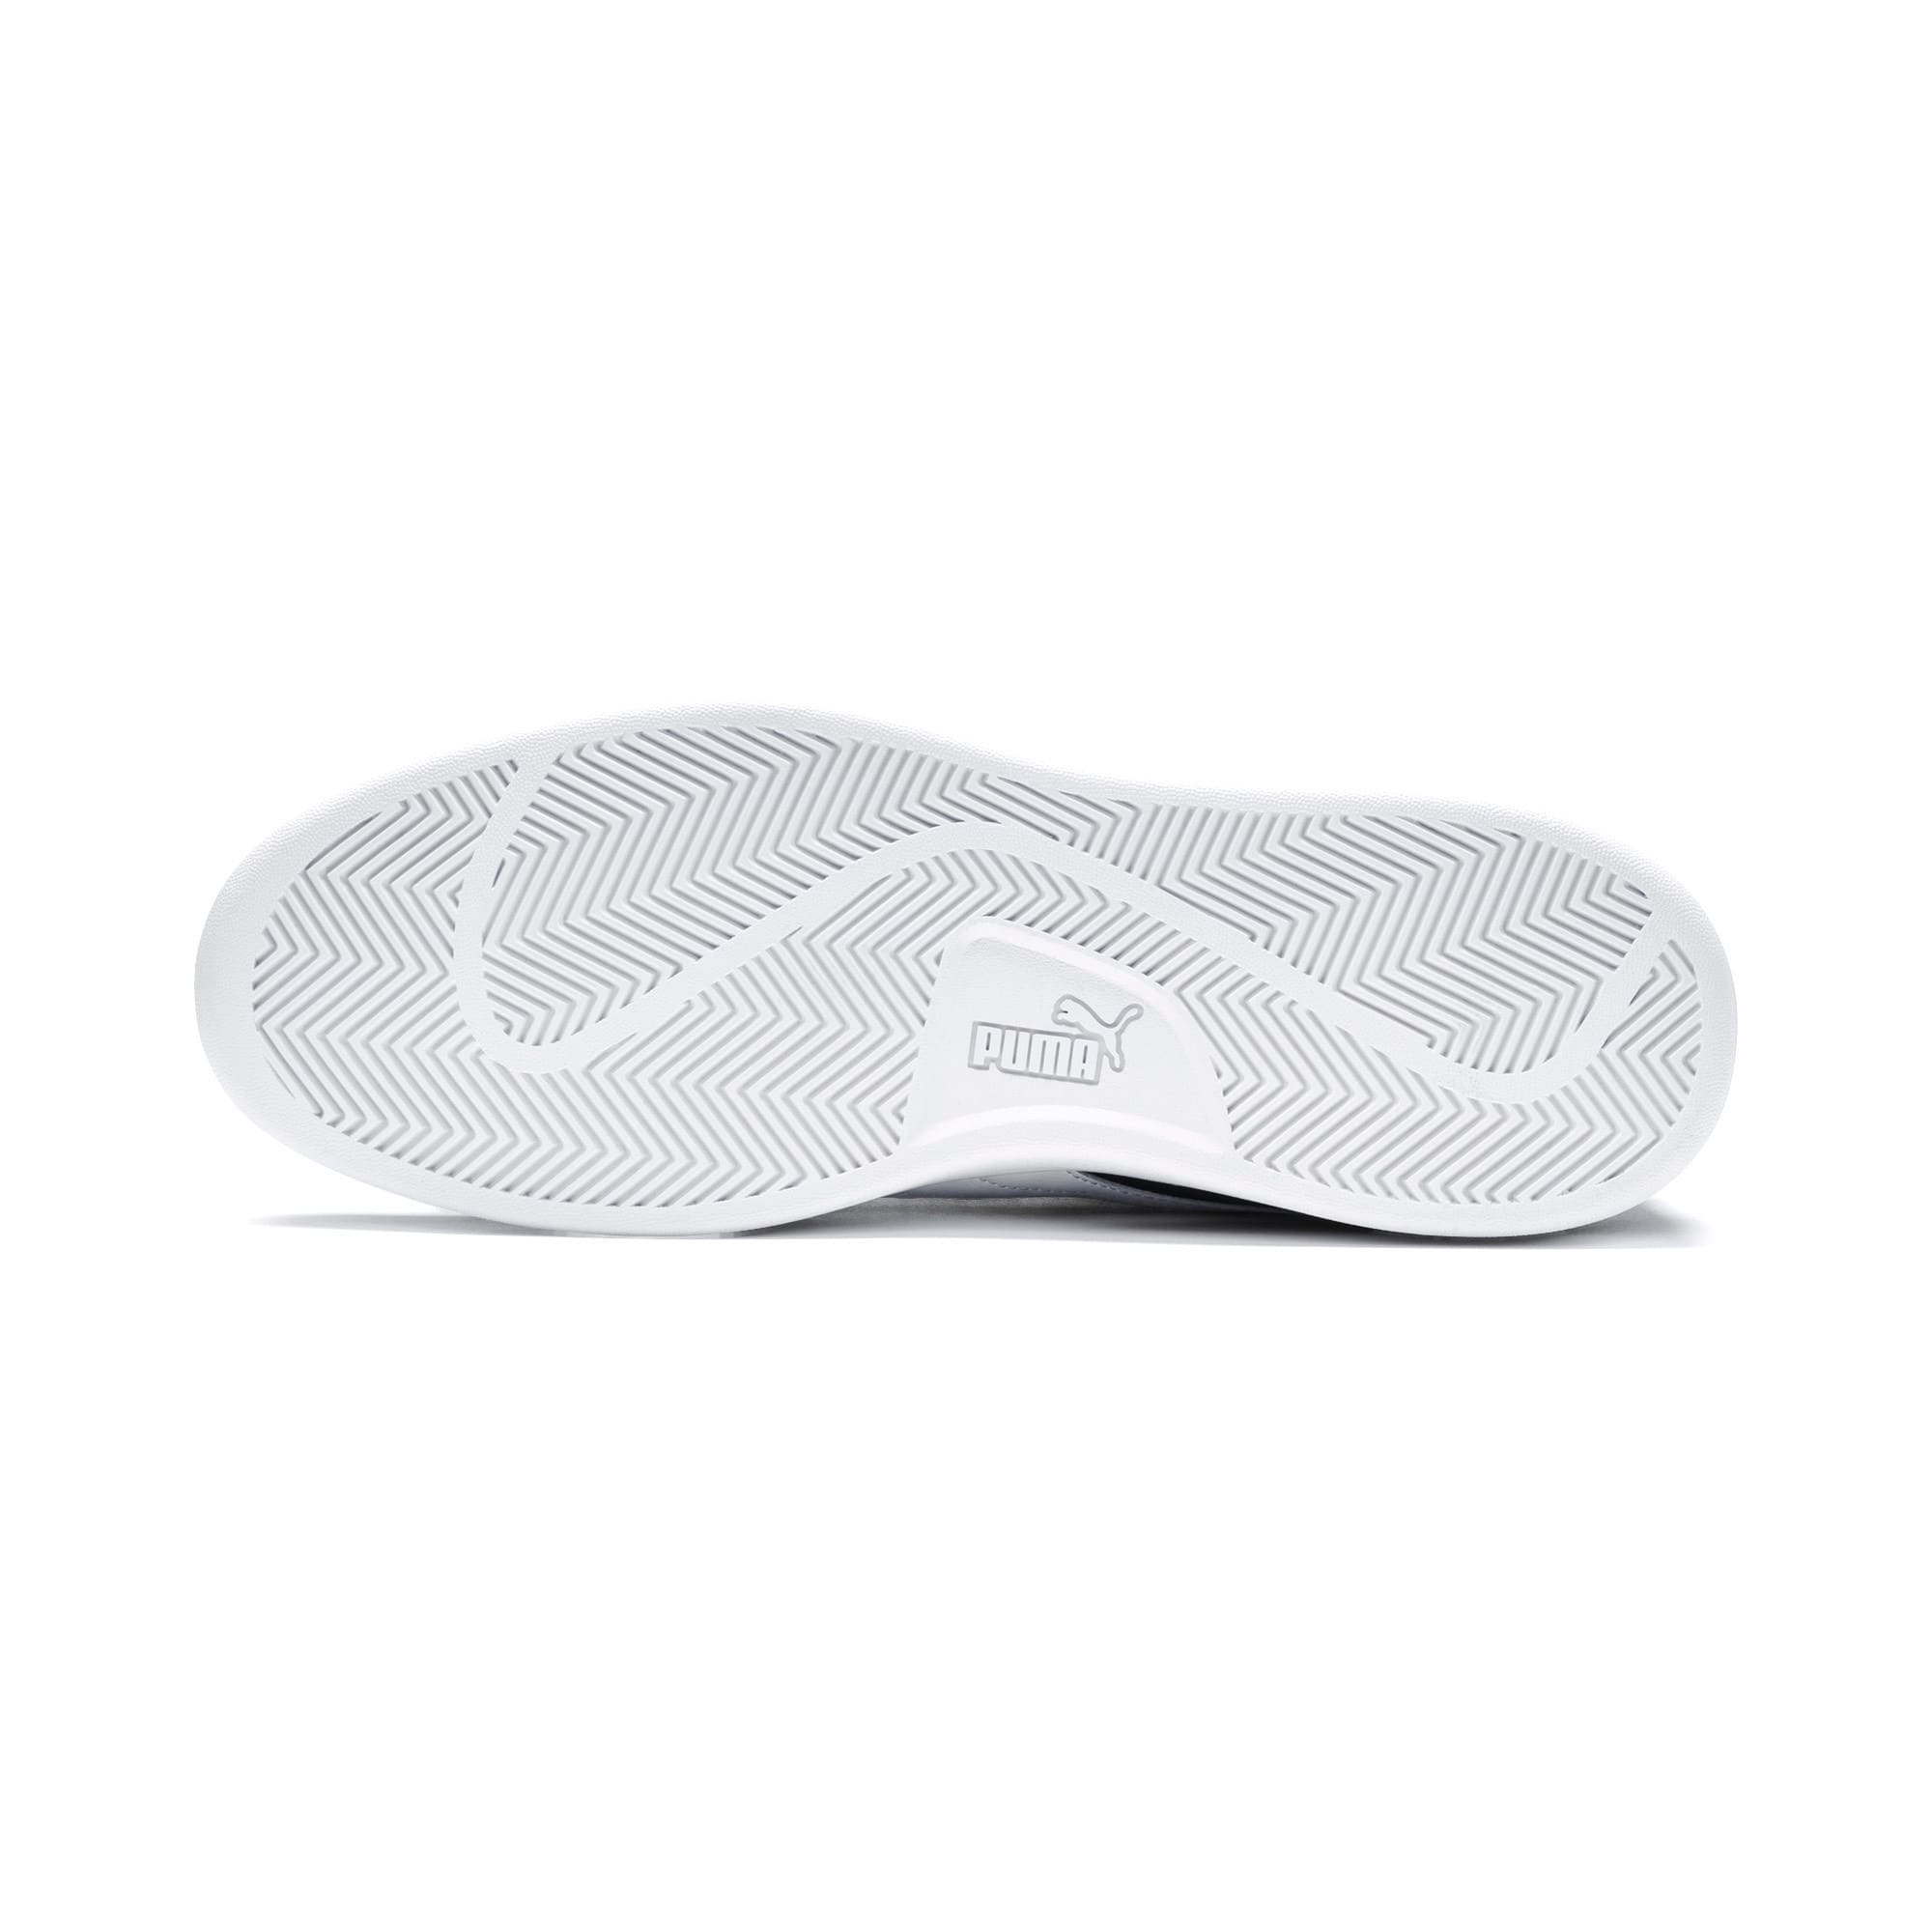 Thumbnail 5 of Astro Kick Sneakers, Puma Black-Puma White, medium